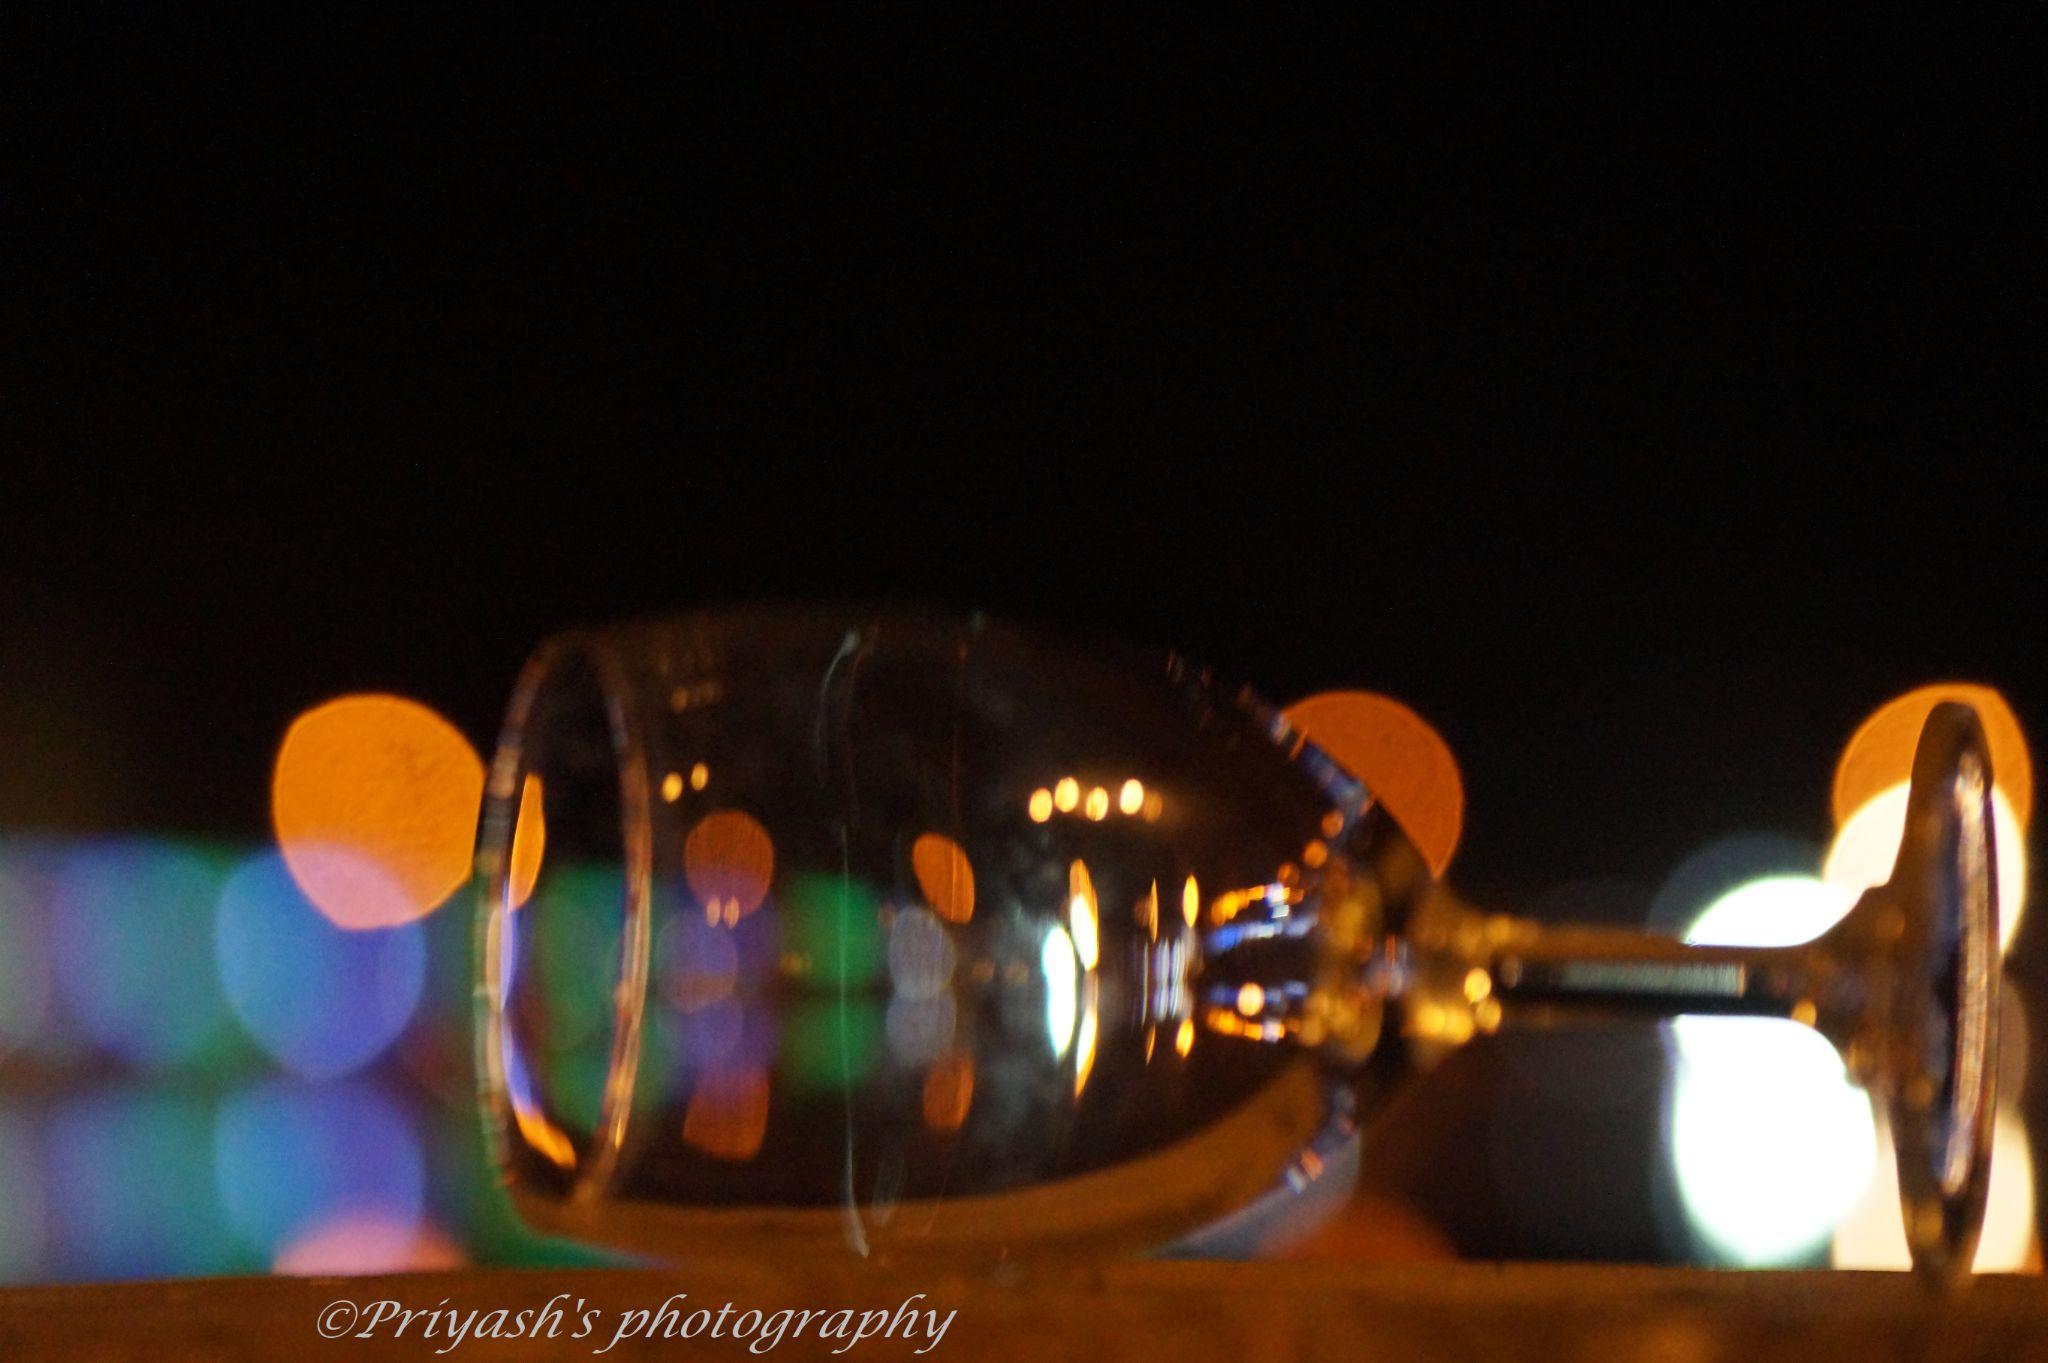 Untitled by priyash.jain3